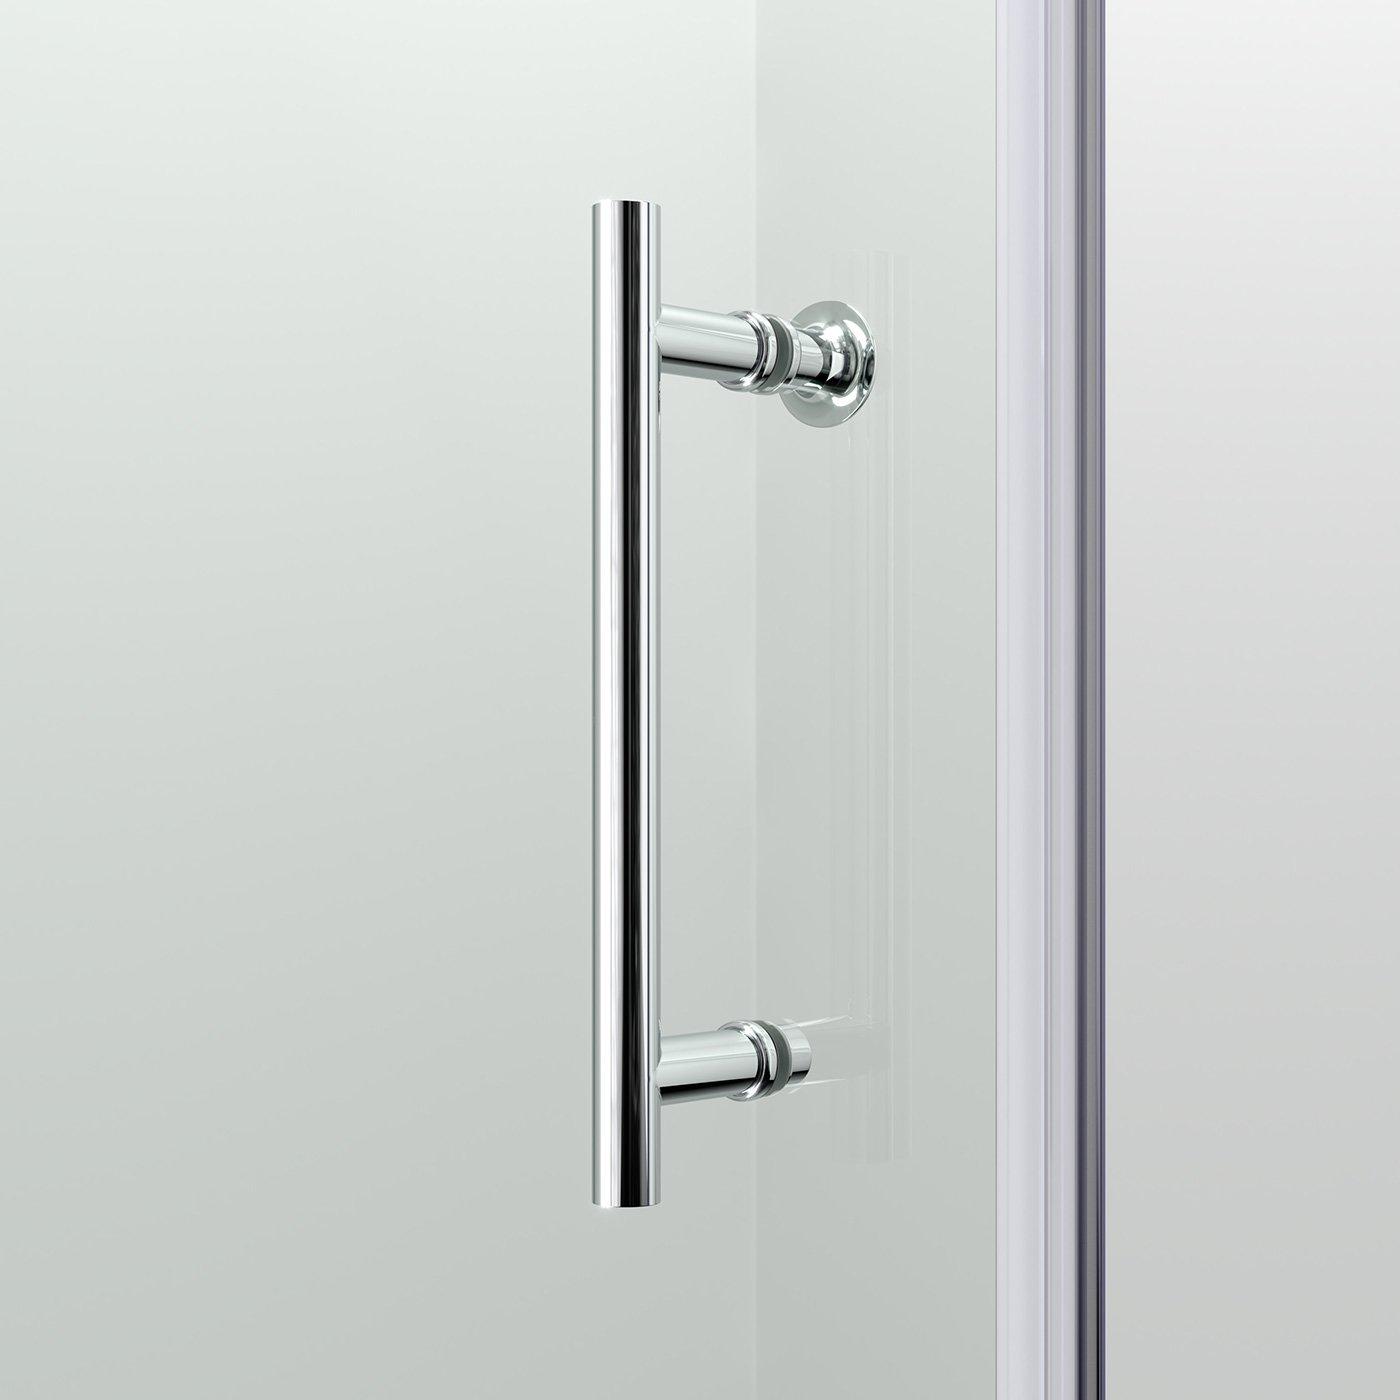 Ibathuk 1200Mm Modern Sliding 6Mm Glass Shower Enclosure Reversible Cubicle